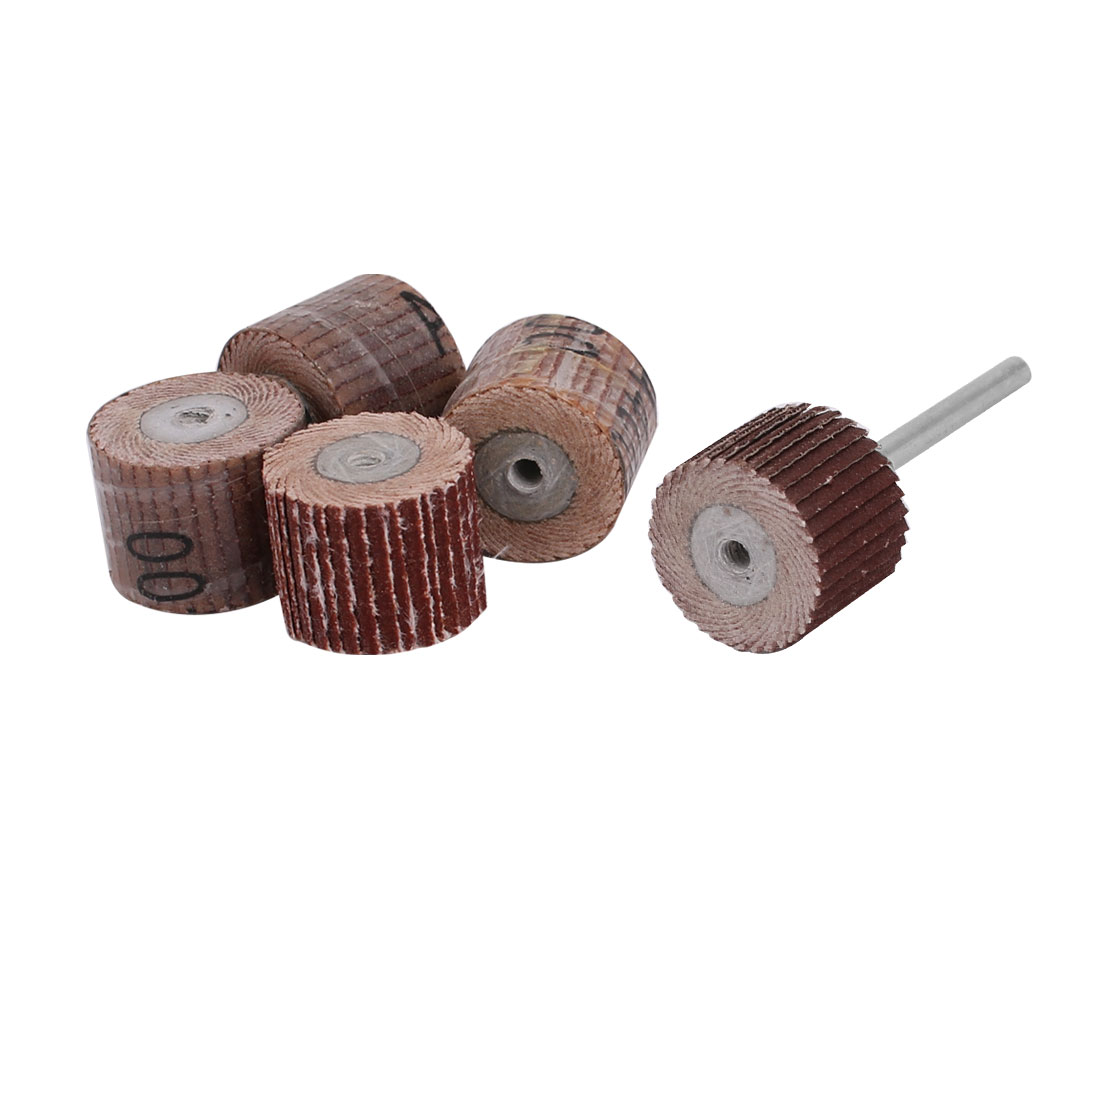 5pcs 15mm Dia 400 Grit Sandpaper Flap Sanding Wheel Grinding Head w Mandrel